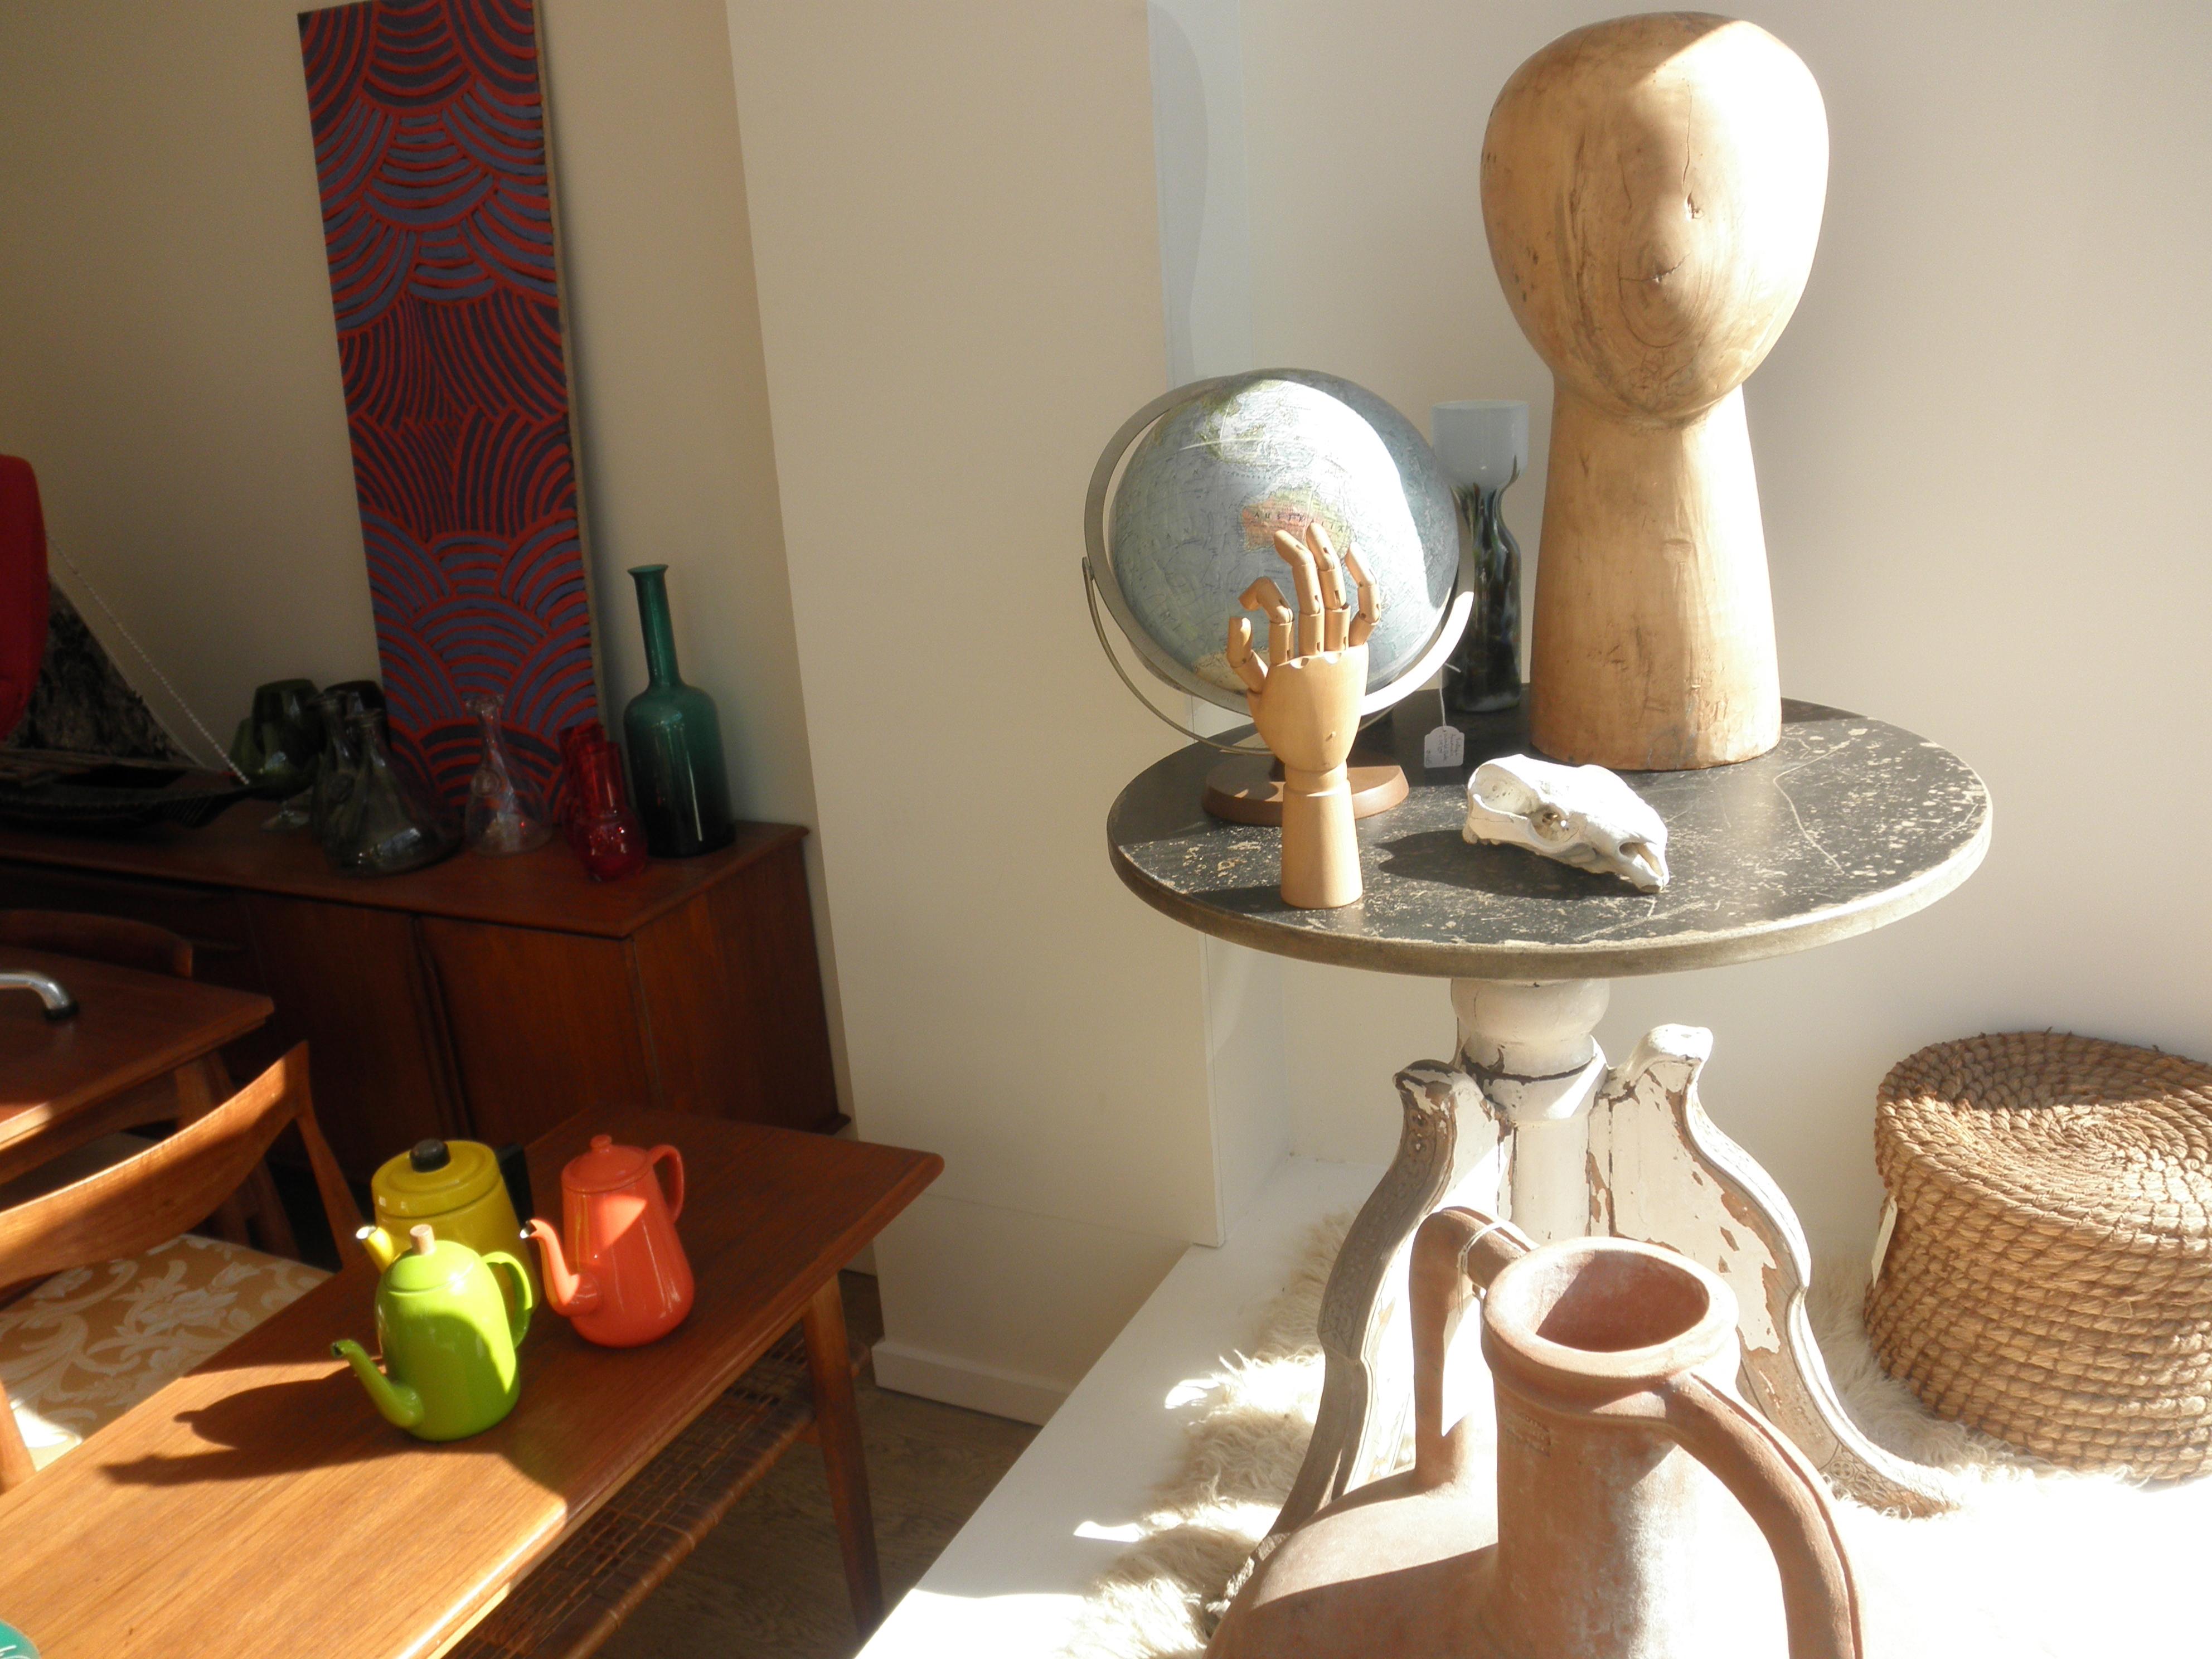 Danish Mid Century Modern Furniture Still Popular Today also Projects ...